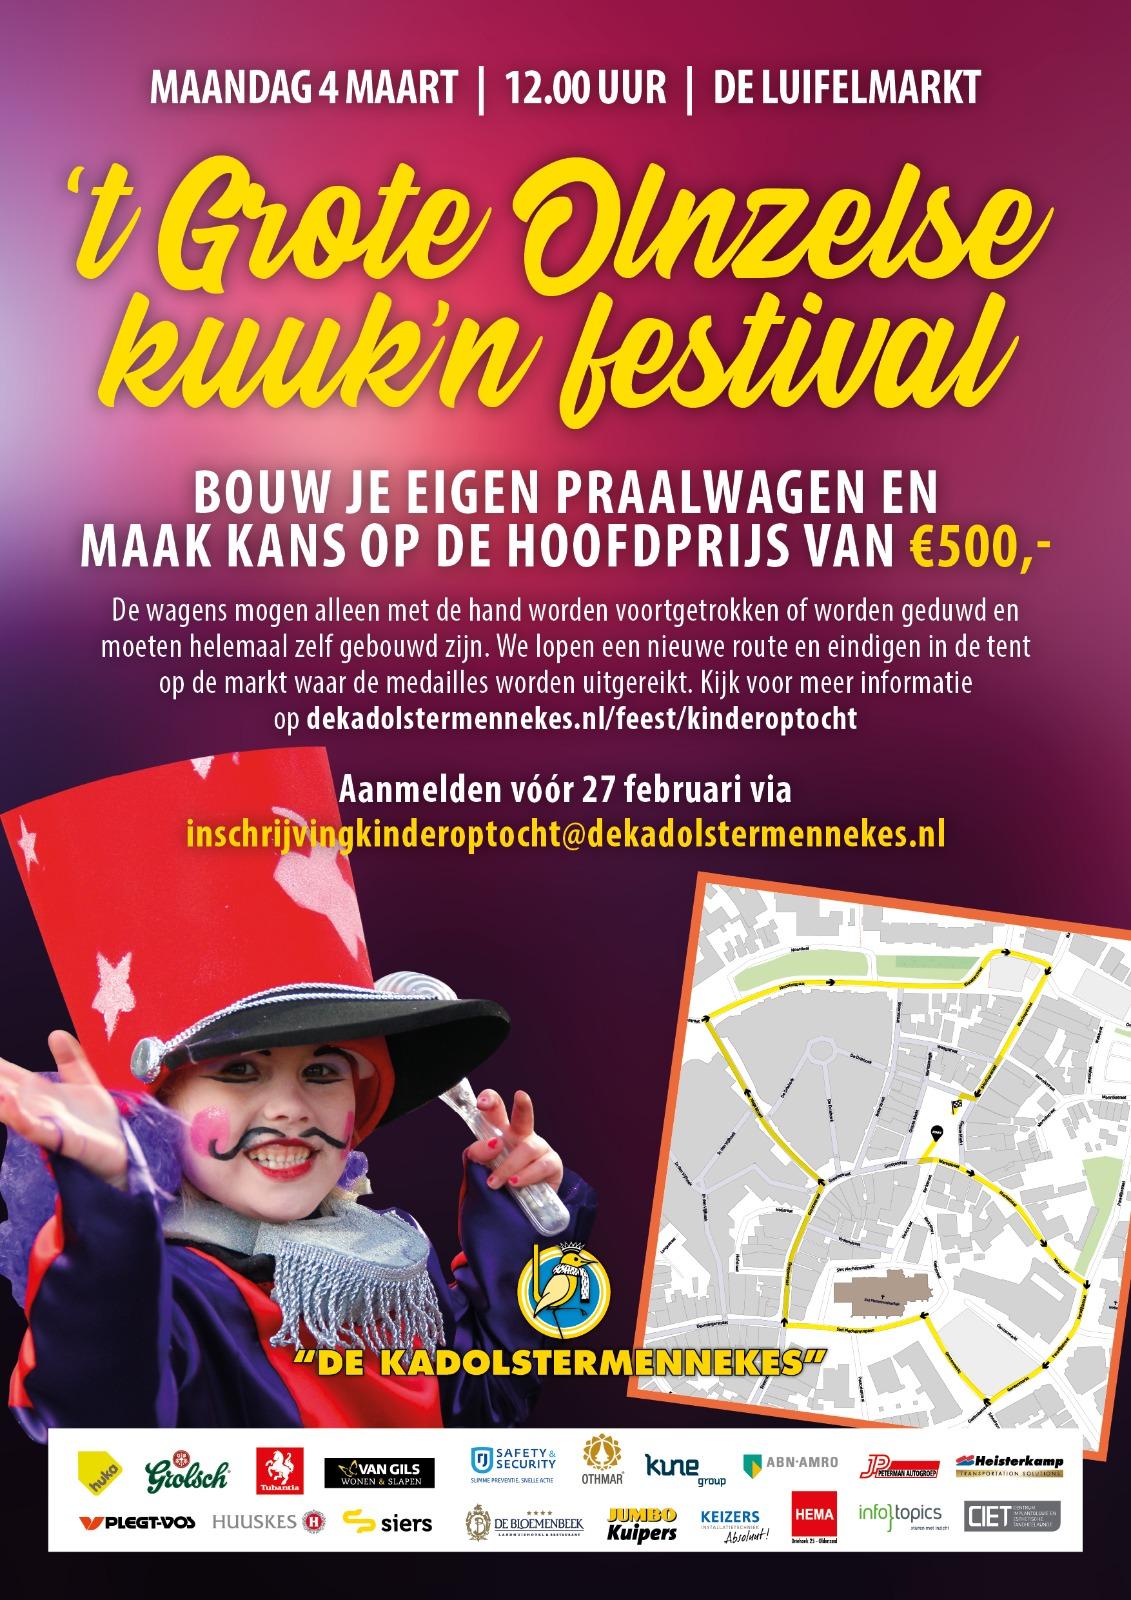 Win prijzen in de kinderoptocht van 't Grote Olnzelse Kuuk'n festival 2019